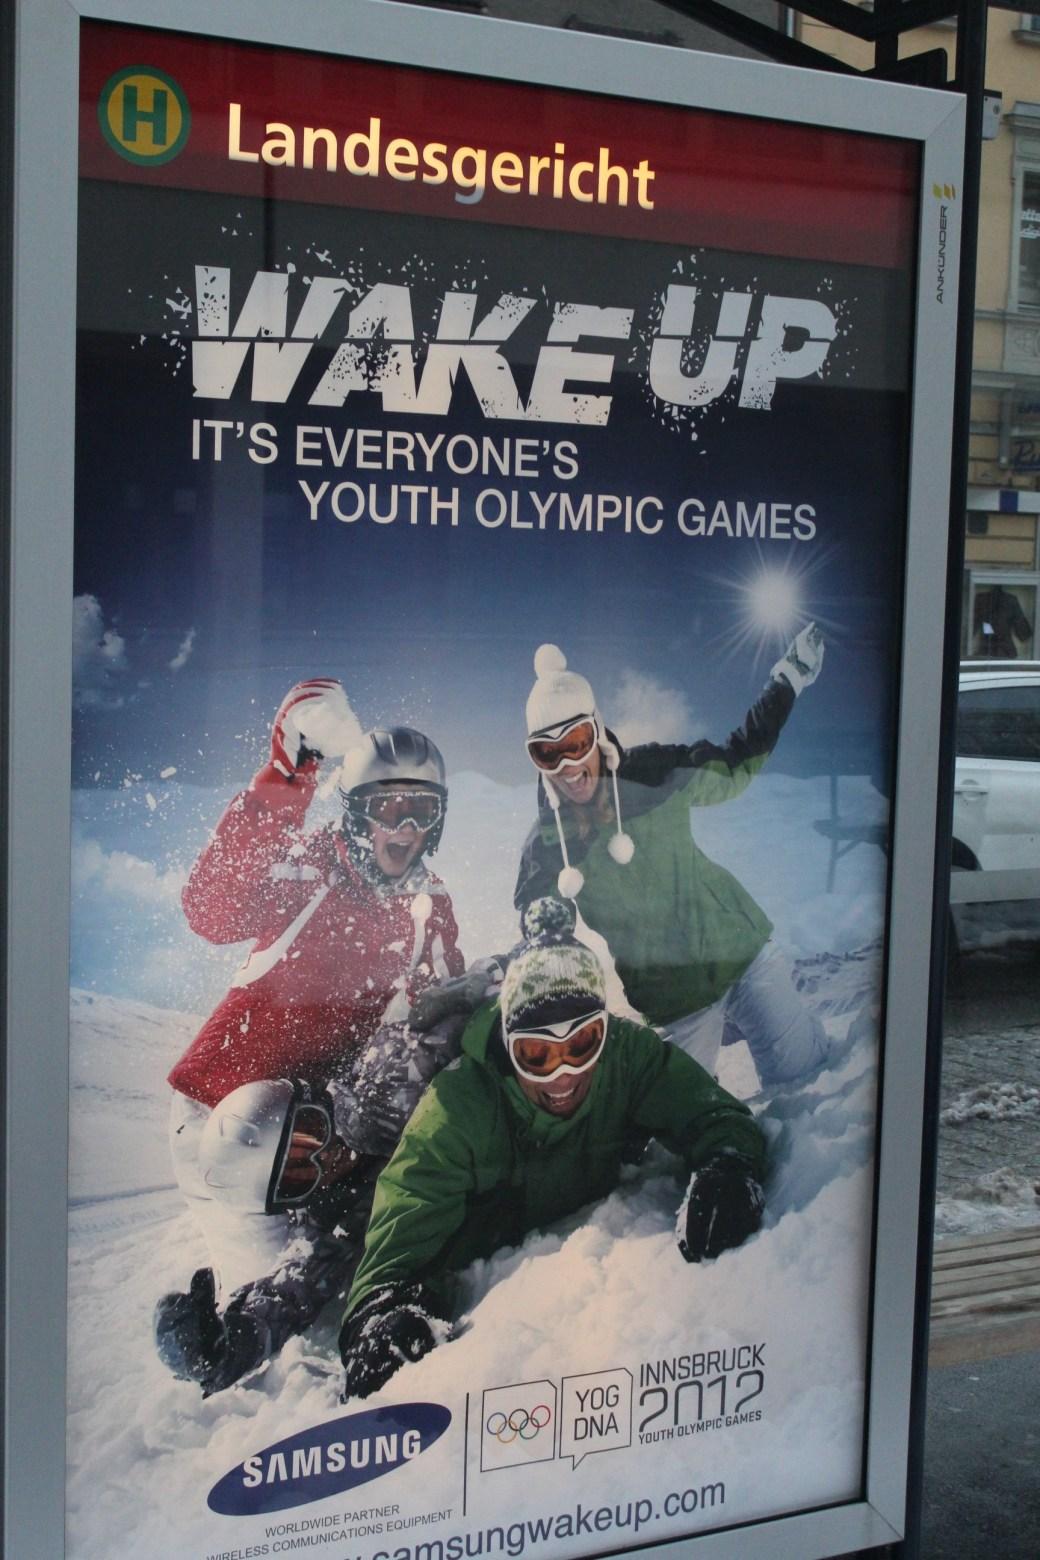 Youth Olympics; Innsbruck, Austria; 2012